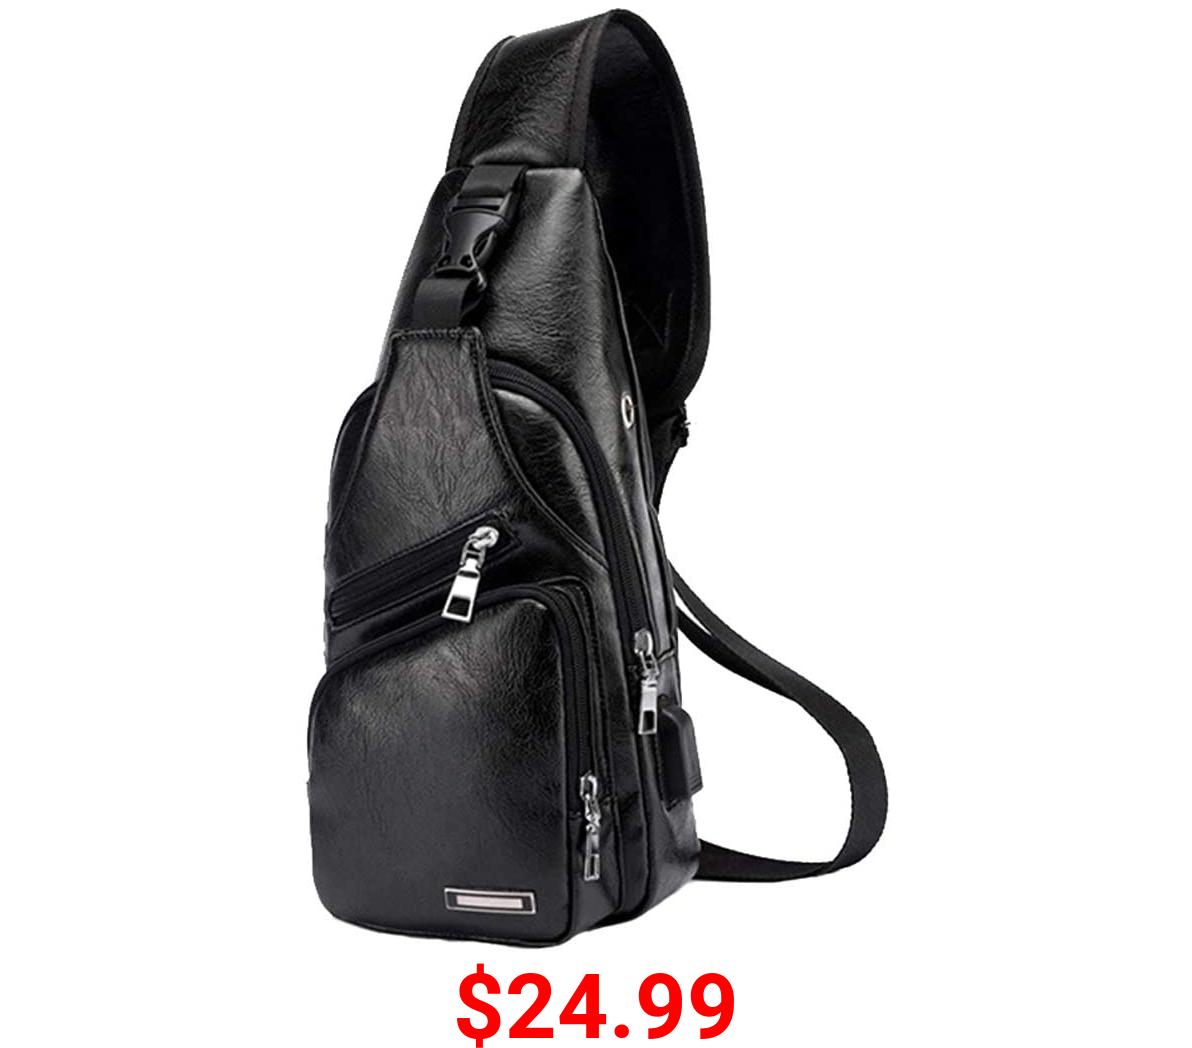 Large Men's Leather Sling Bag Chest Shoulder Backpack Crossbody Bag with USB Charging Port for Travel, Hiking ,Cycling